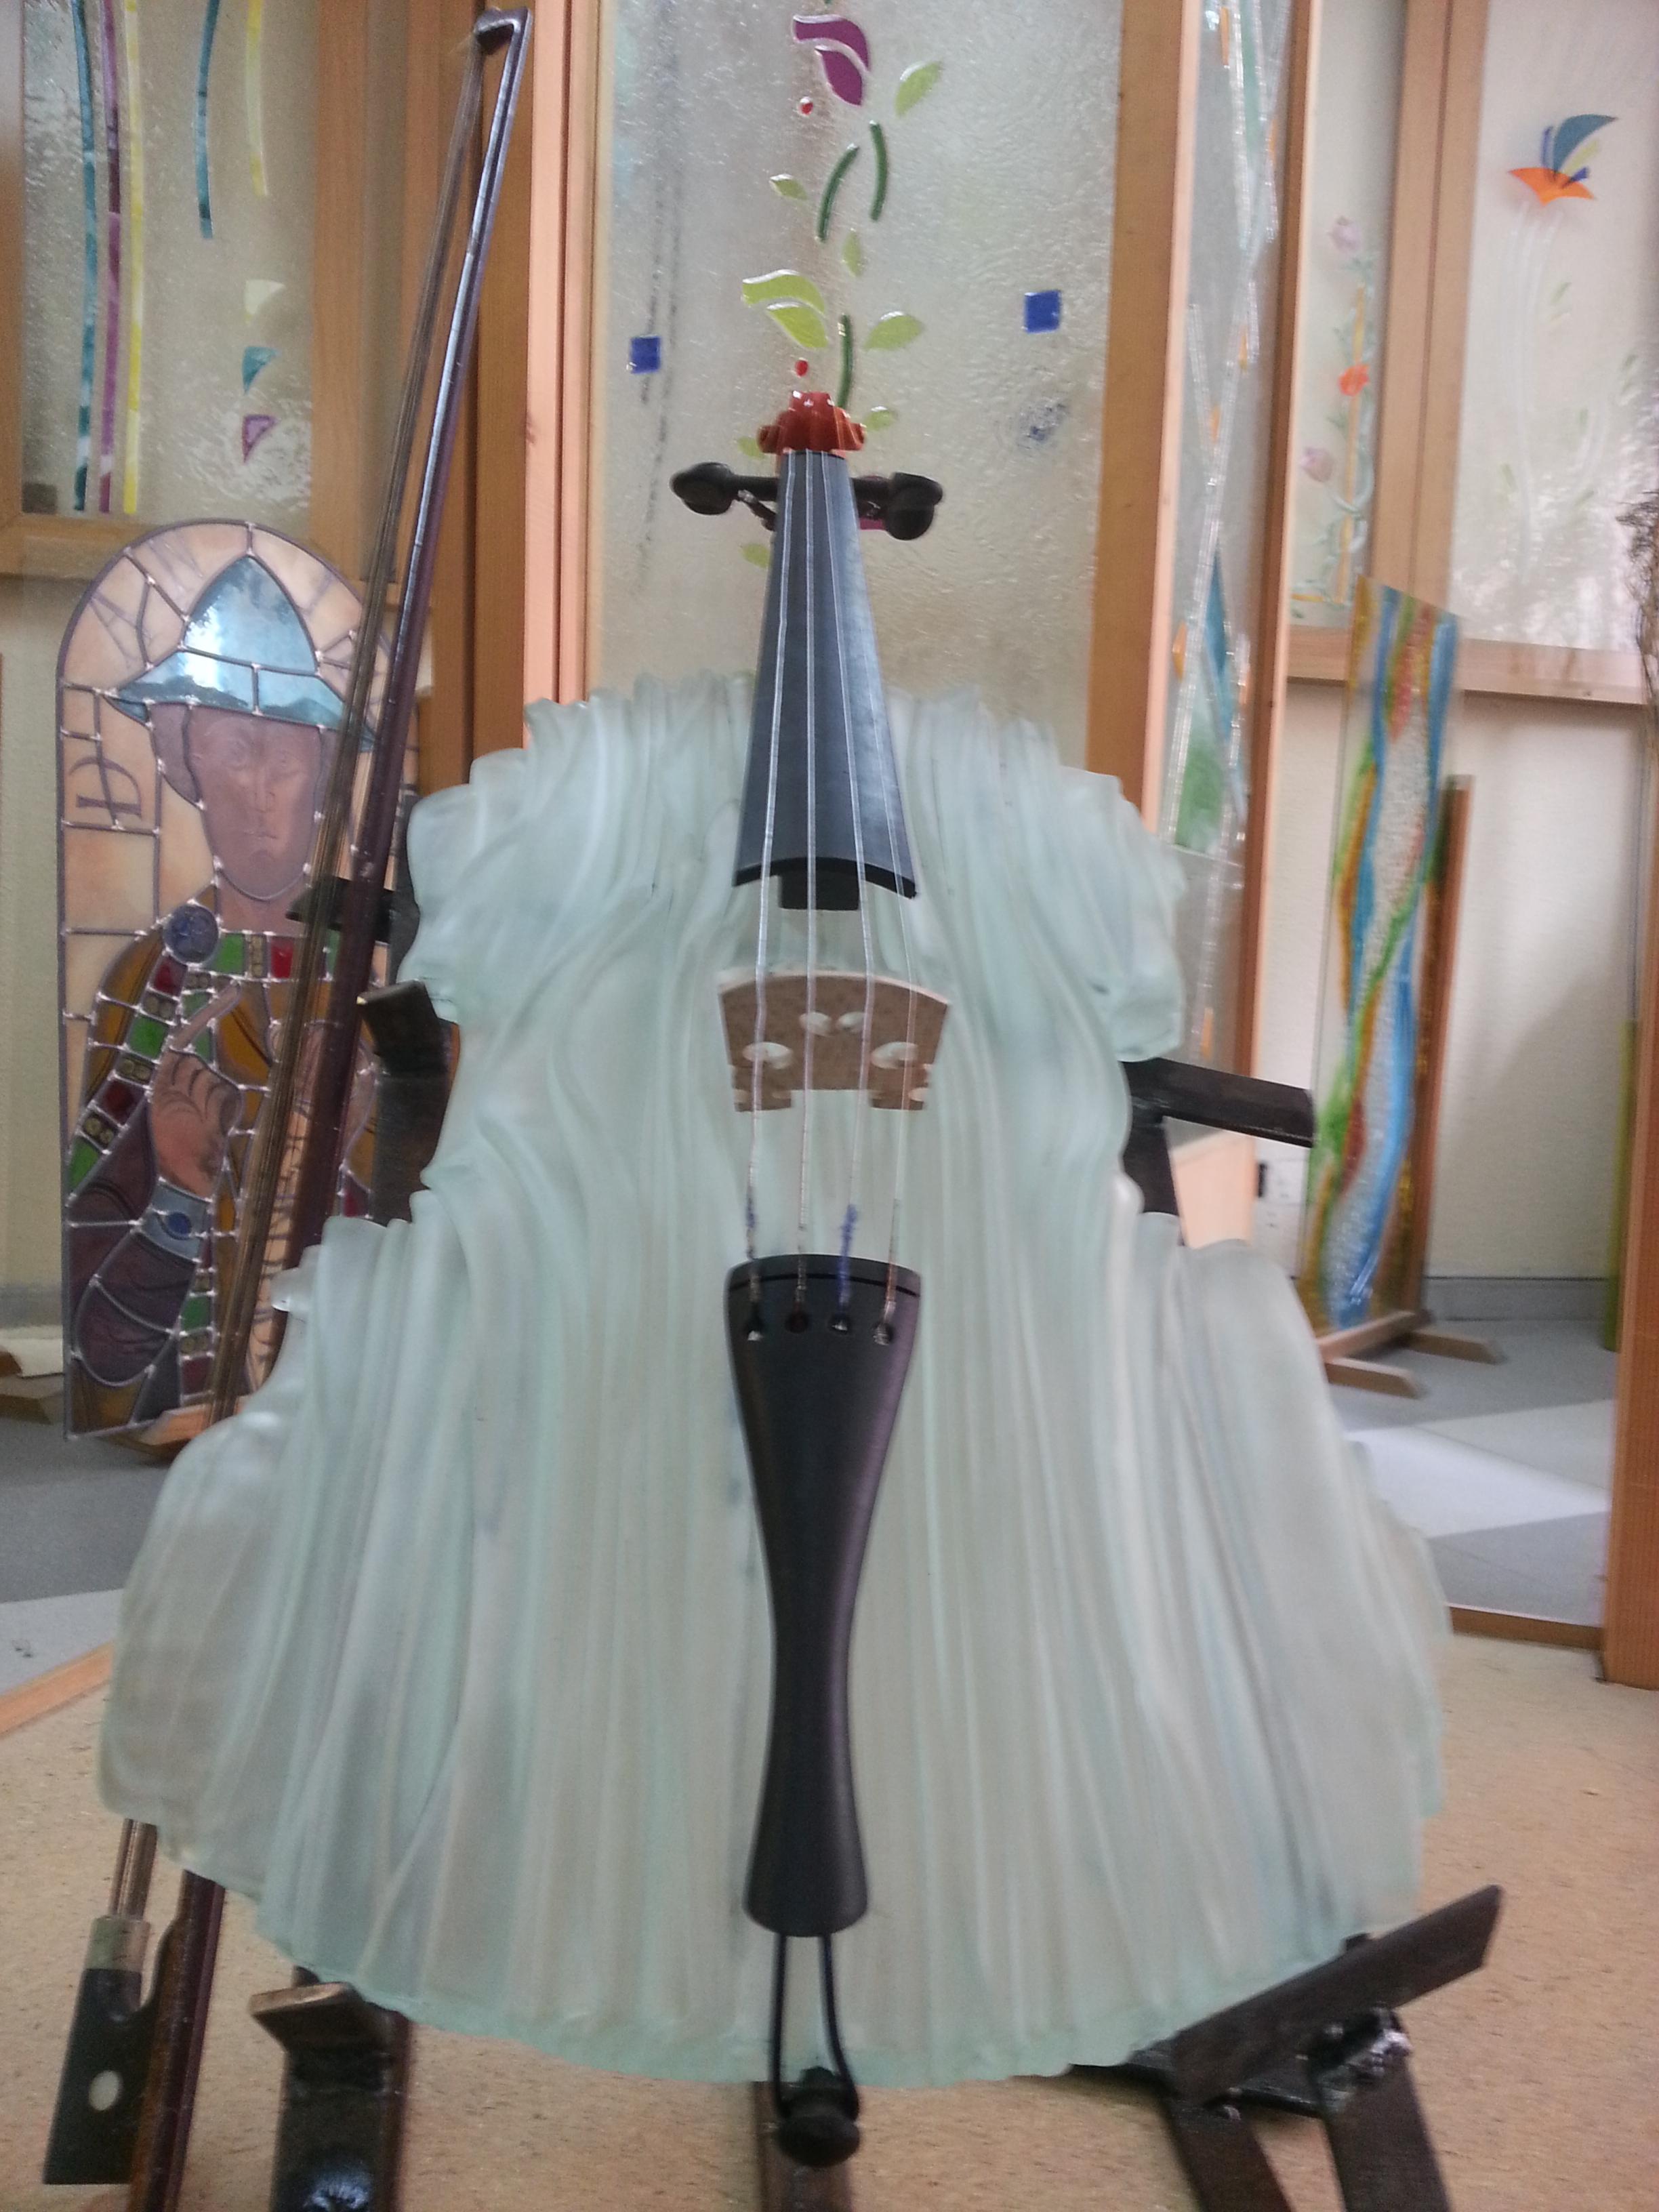 violin_vidrio_cristal_4